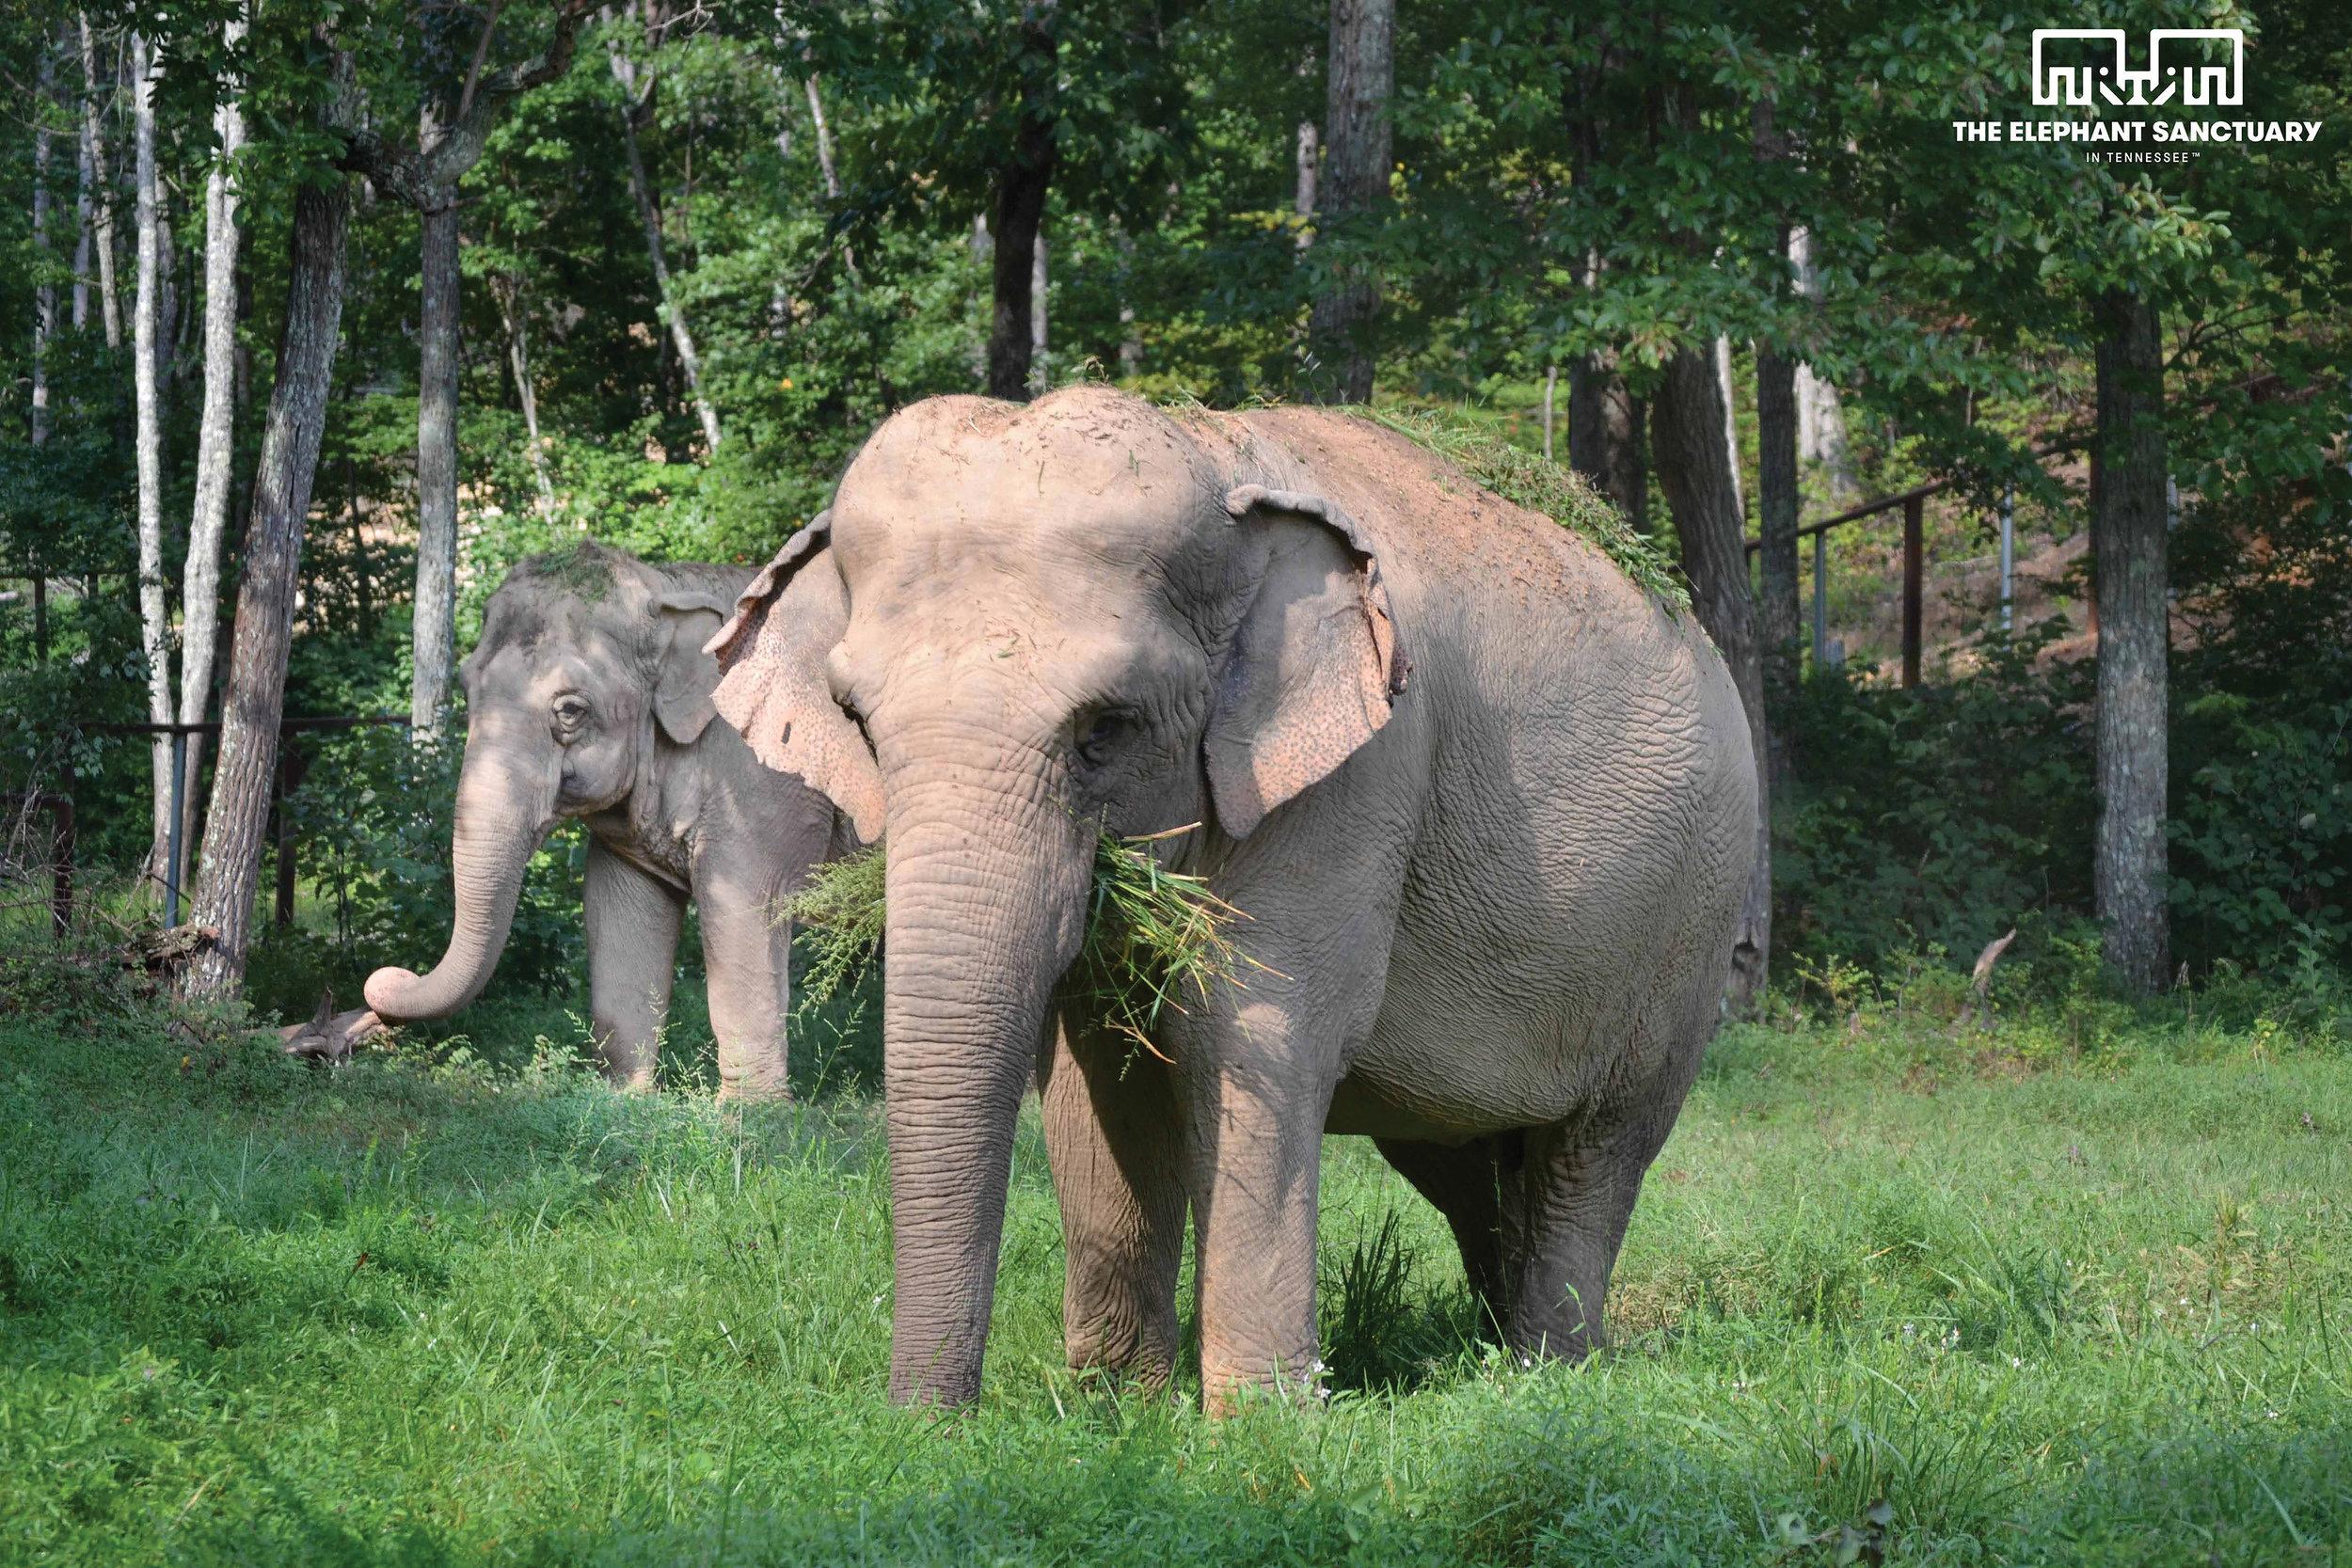 Minnie and Ronnie (Asian Elephants)